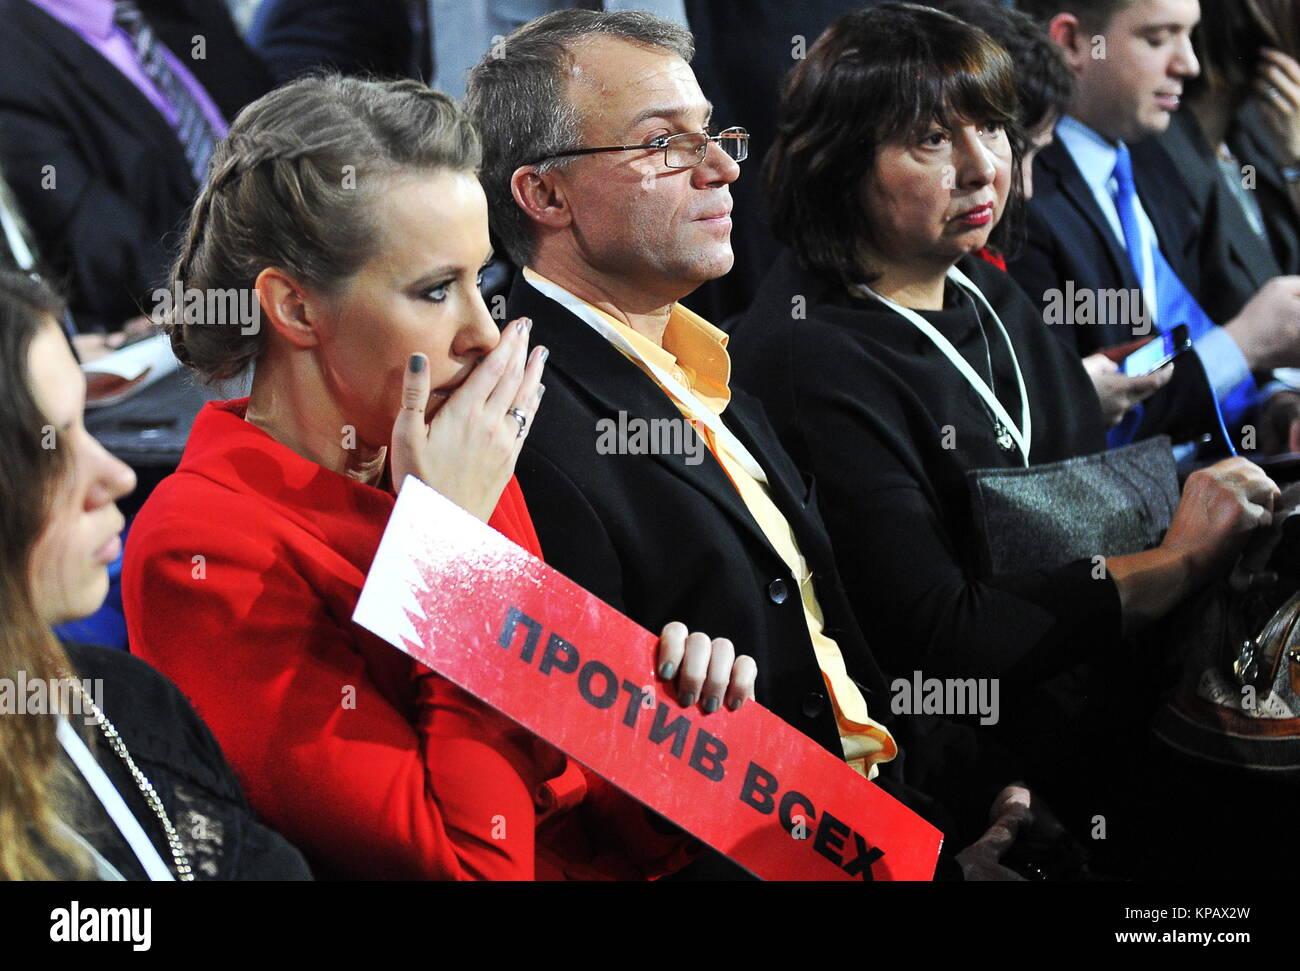 Ksenia Sobchak showed her love triangle 06/19/2011 3